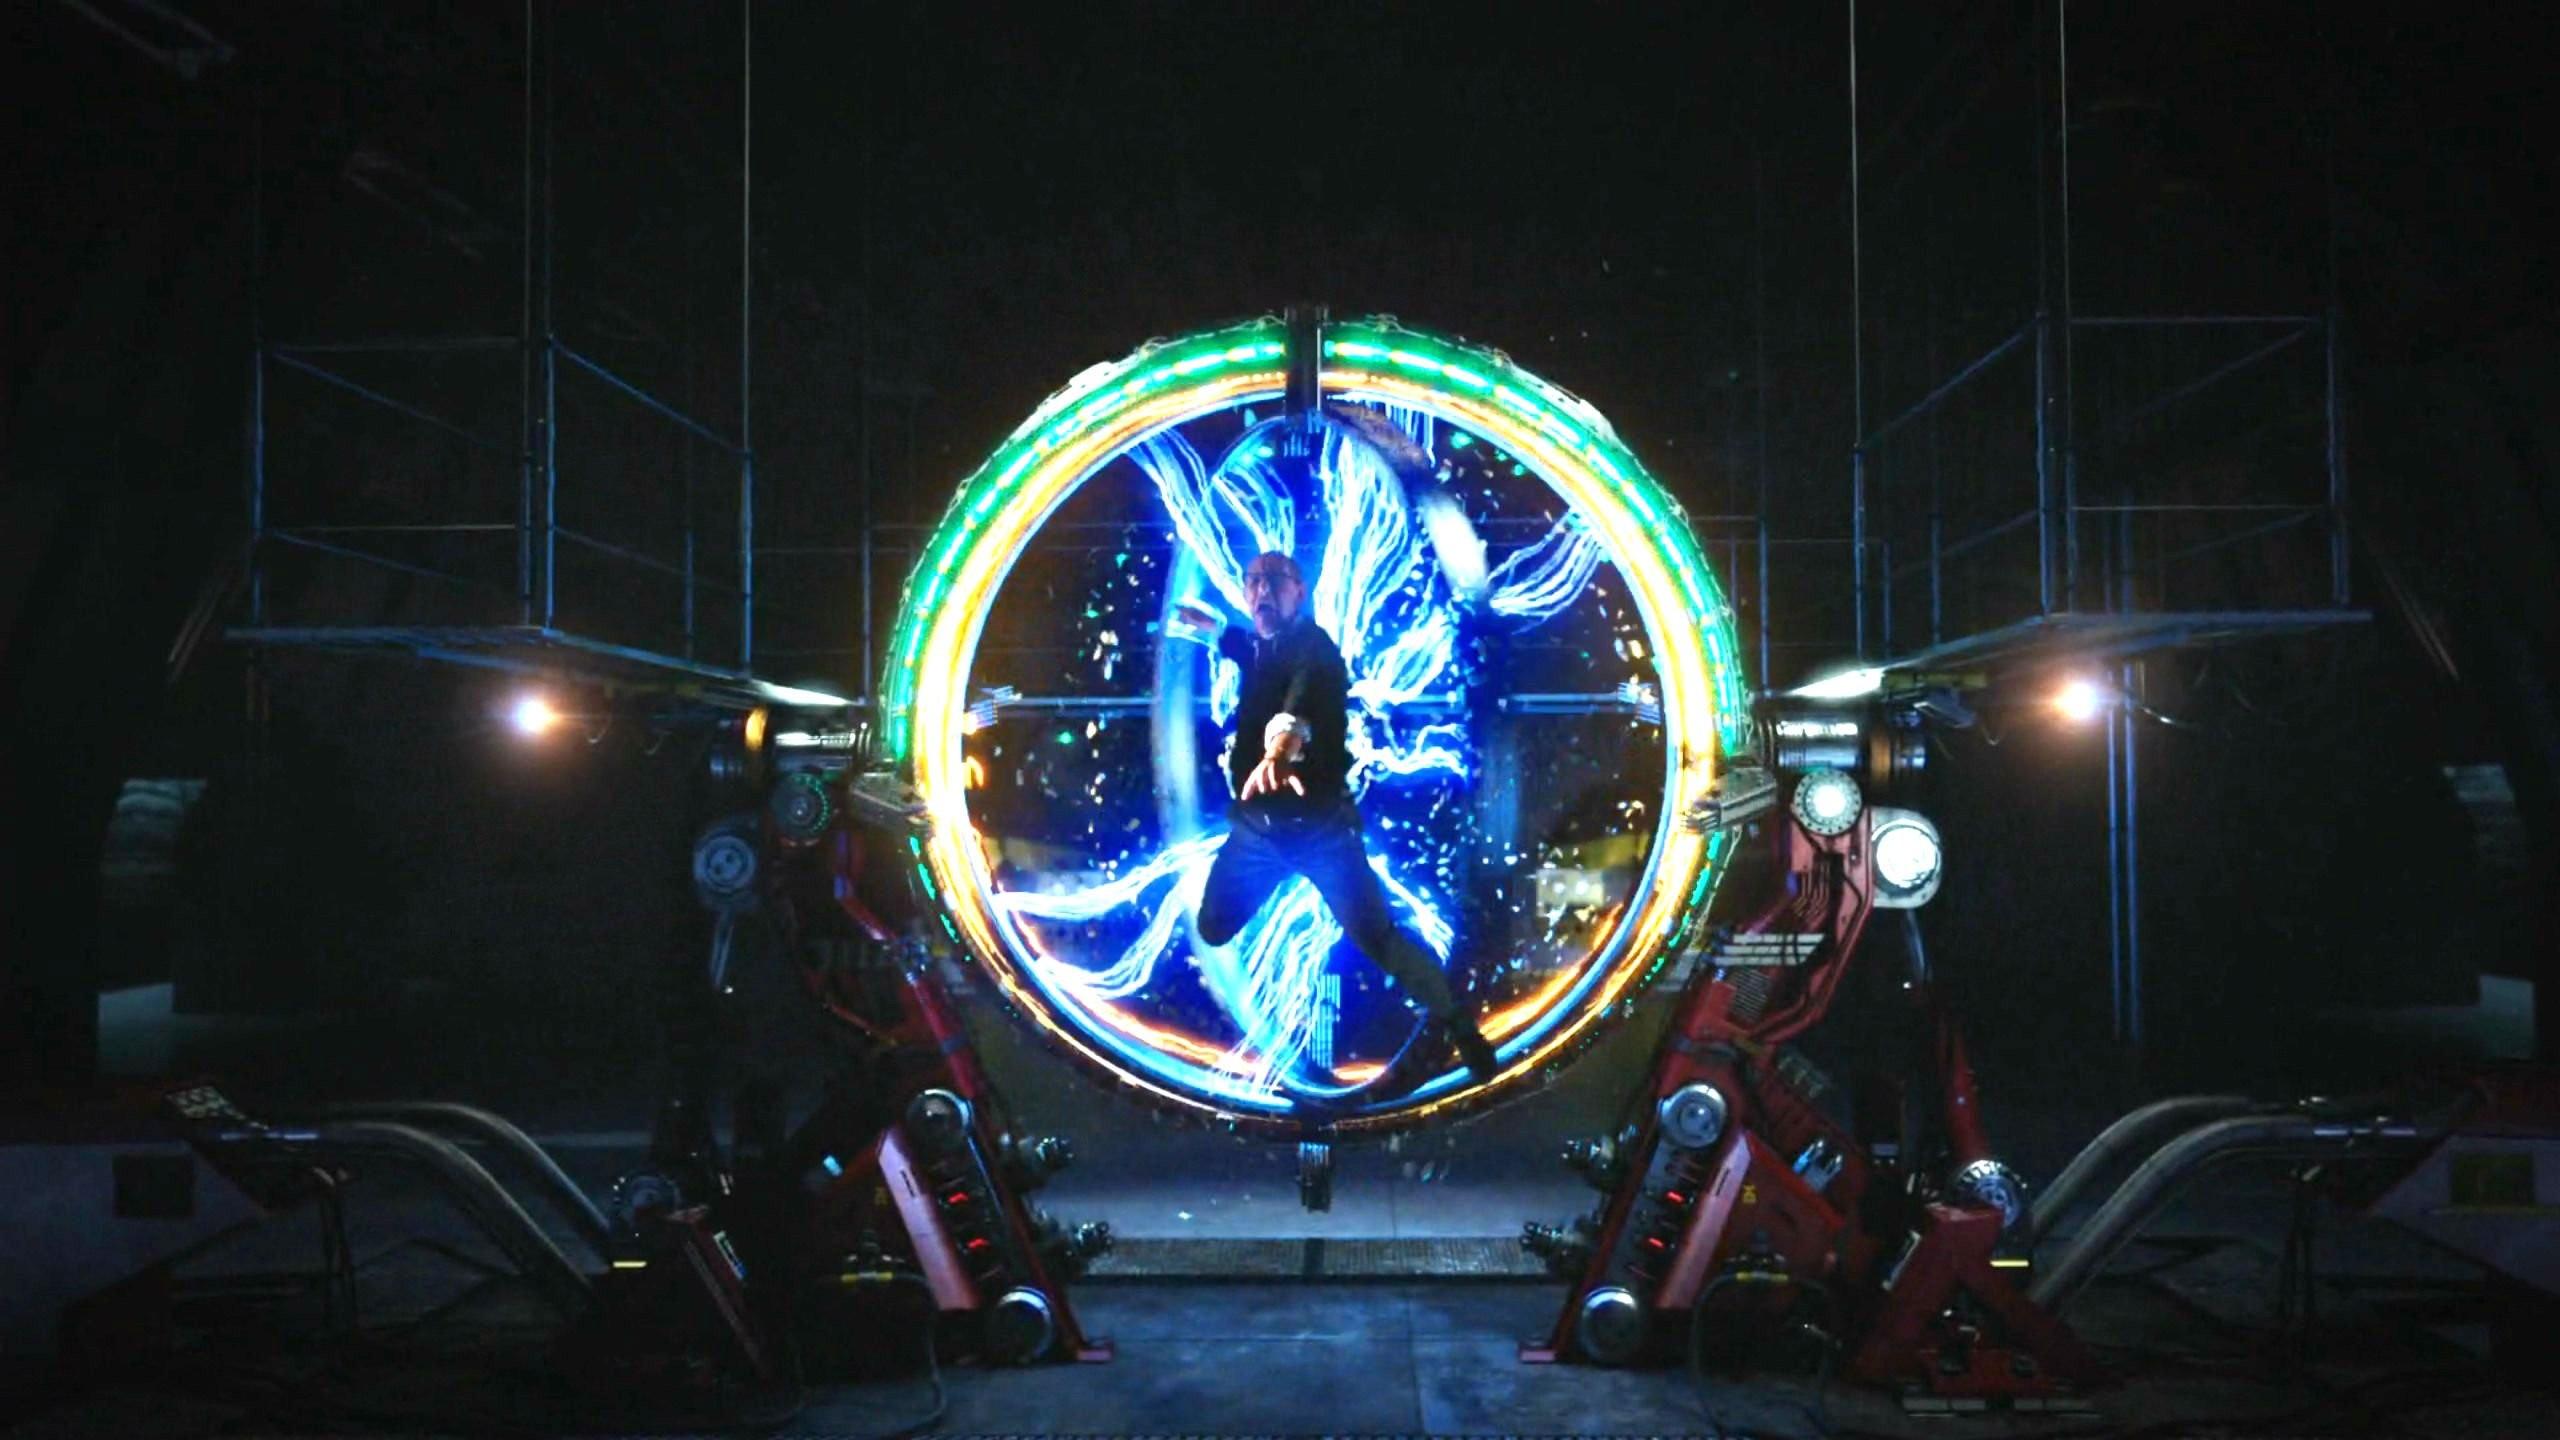 S.H.I.E.L.D. Marvel